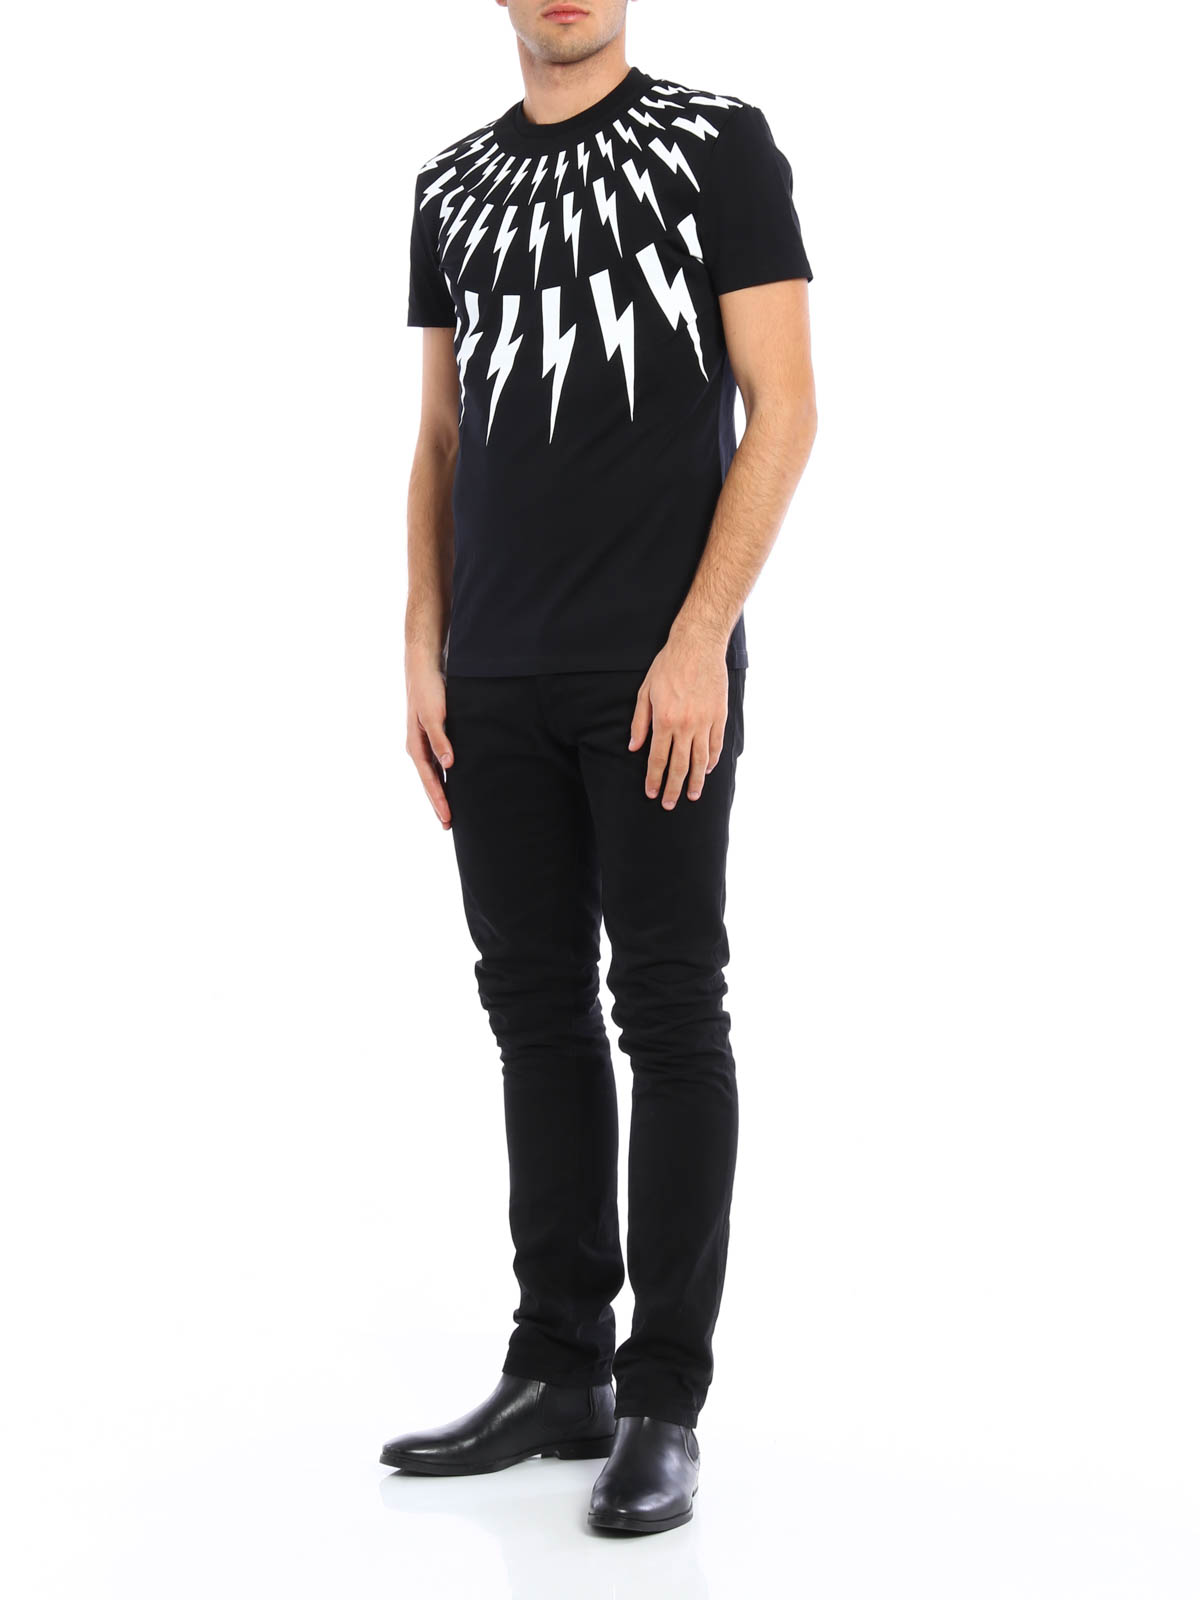 thunderbolt t-shirt Neil Barrett Shop For Online Free Shipping For Nice Sale View TUozMIK5